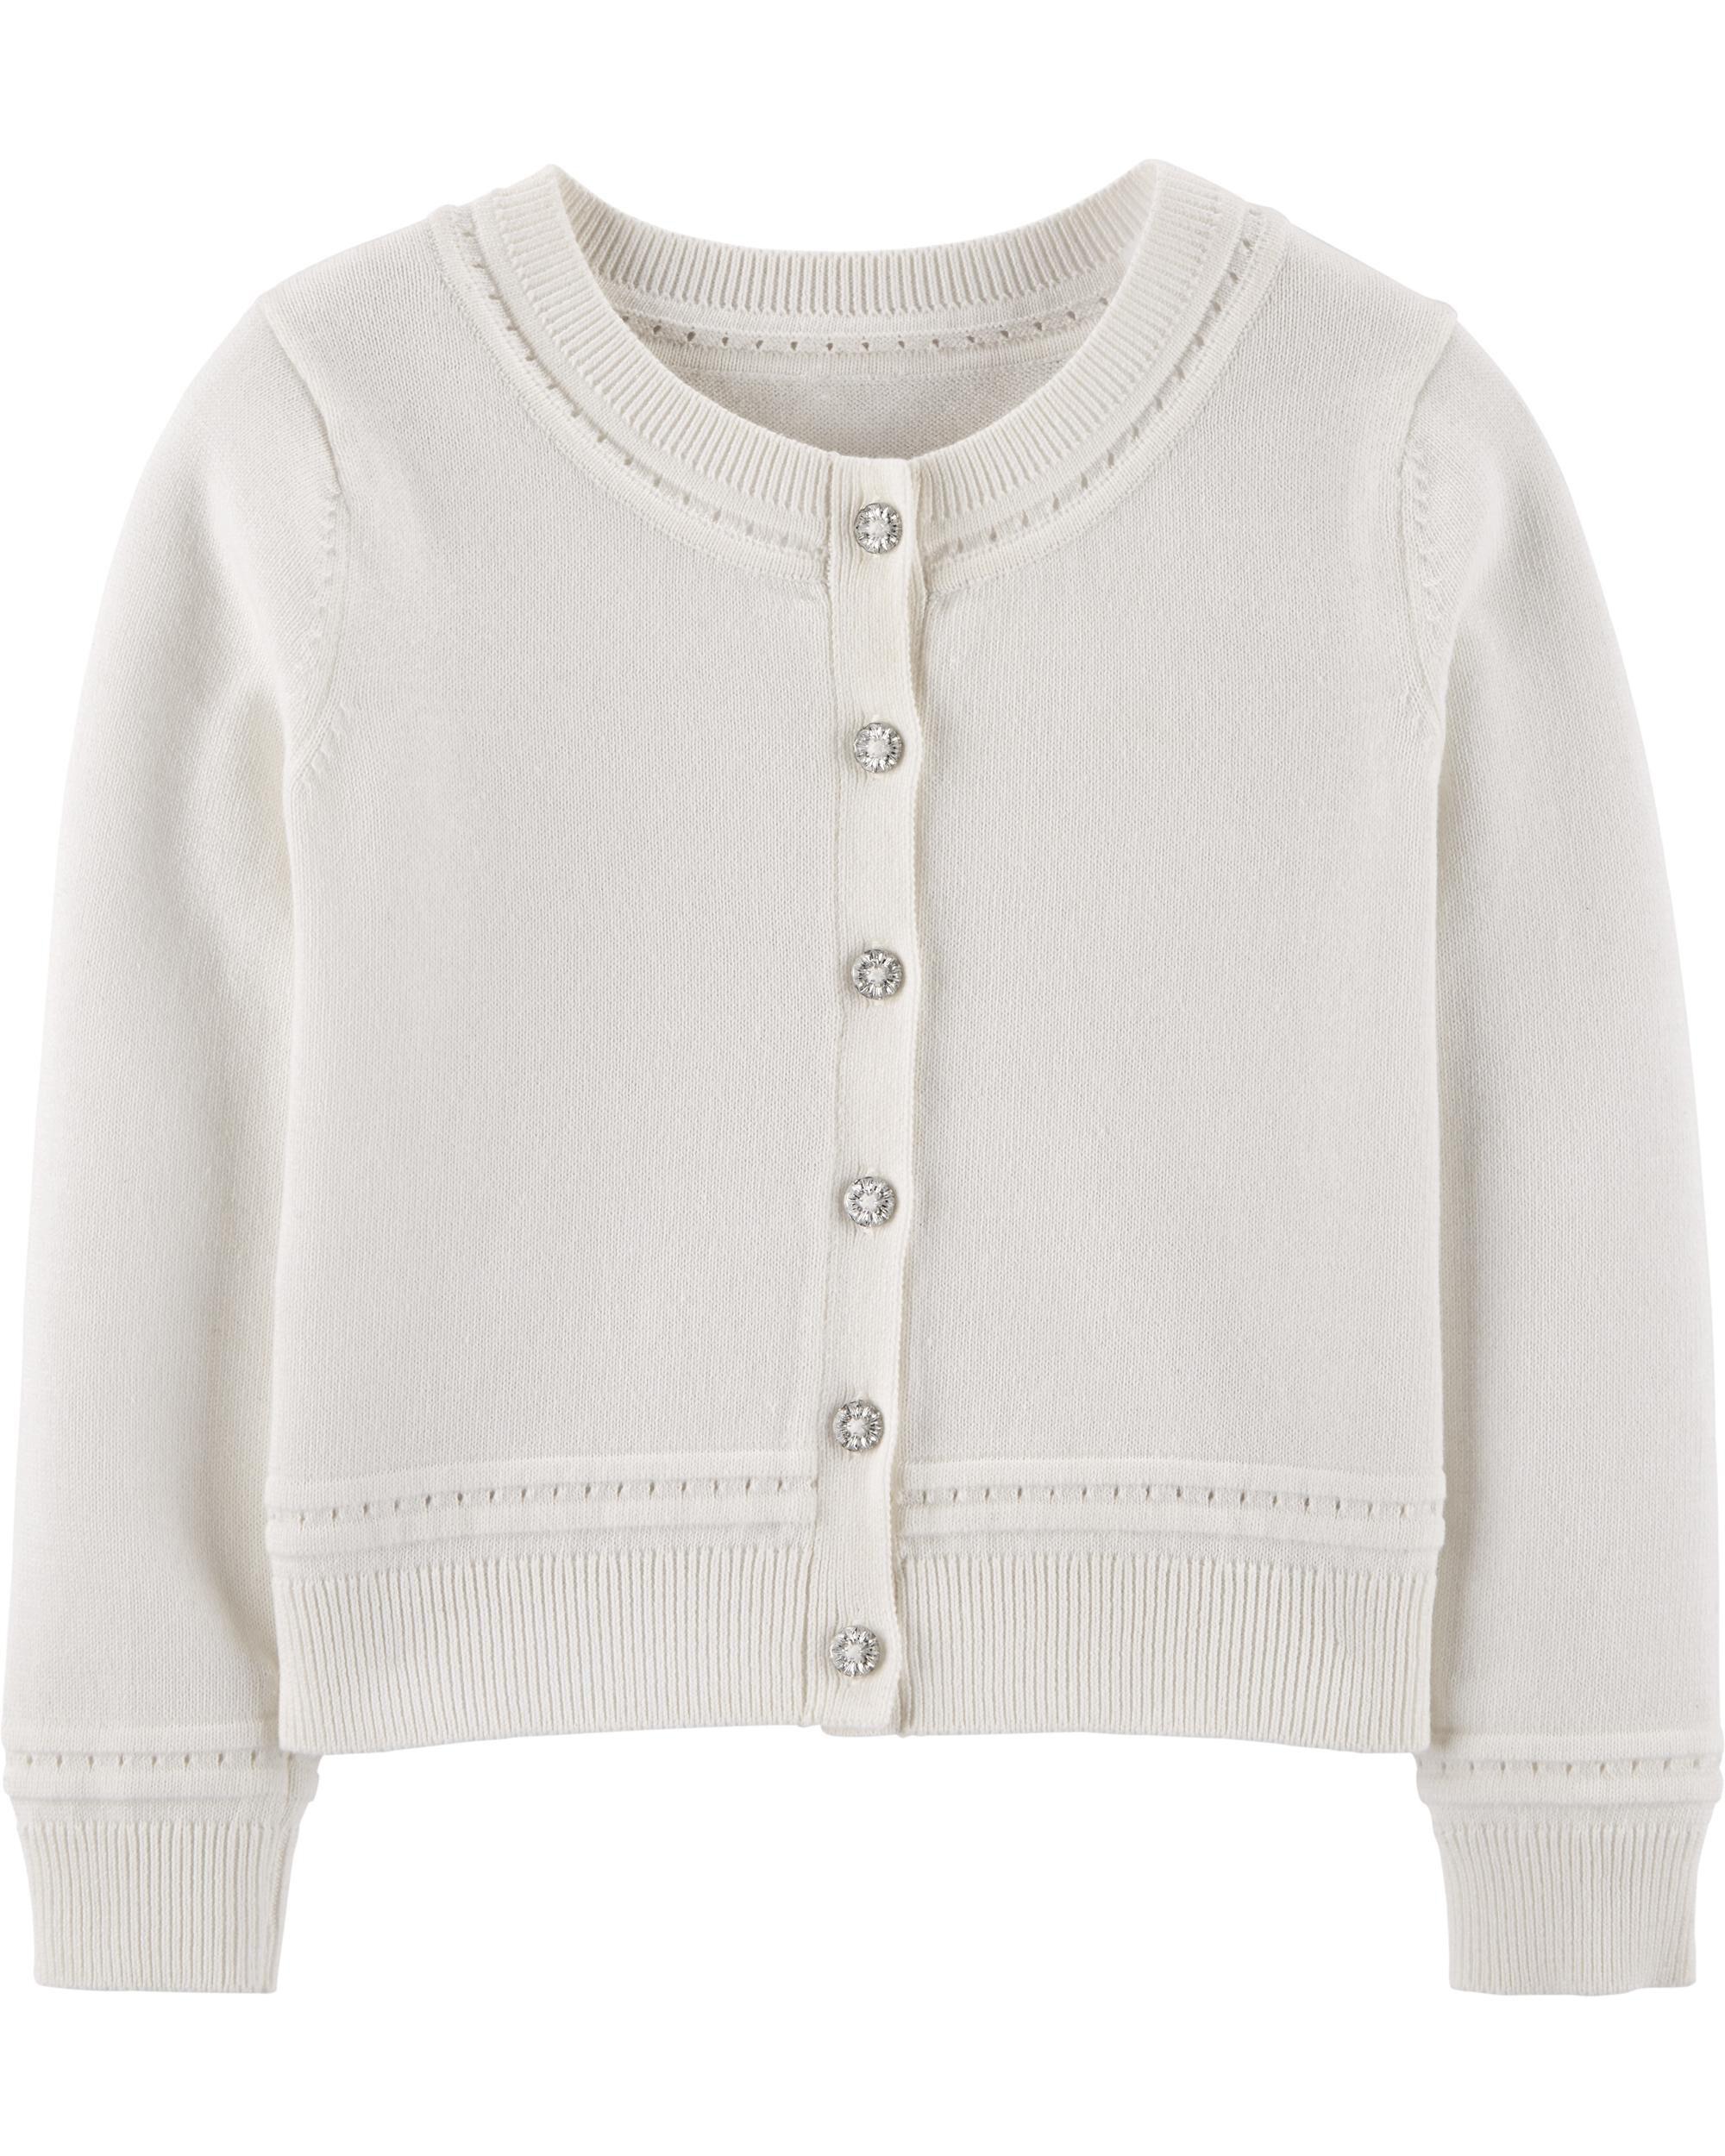 New Carter/'s Girls White Cardigan Sweater Heart Pointelle Design 2T 3T 4T 5T